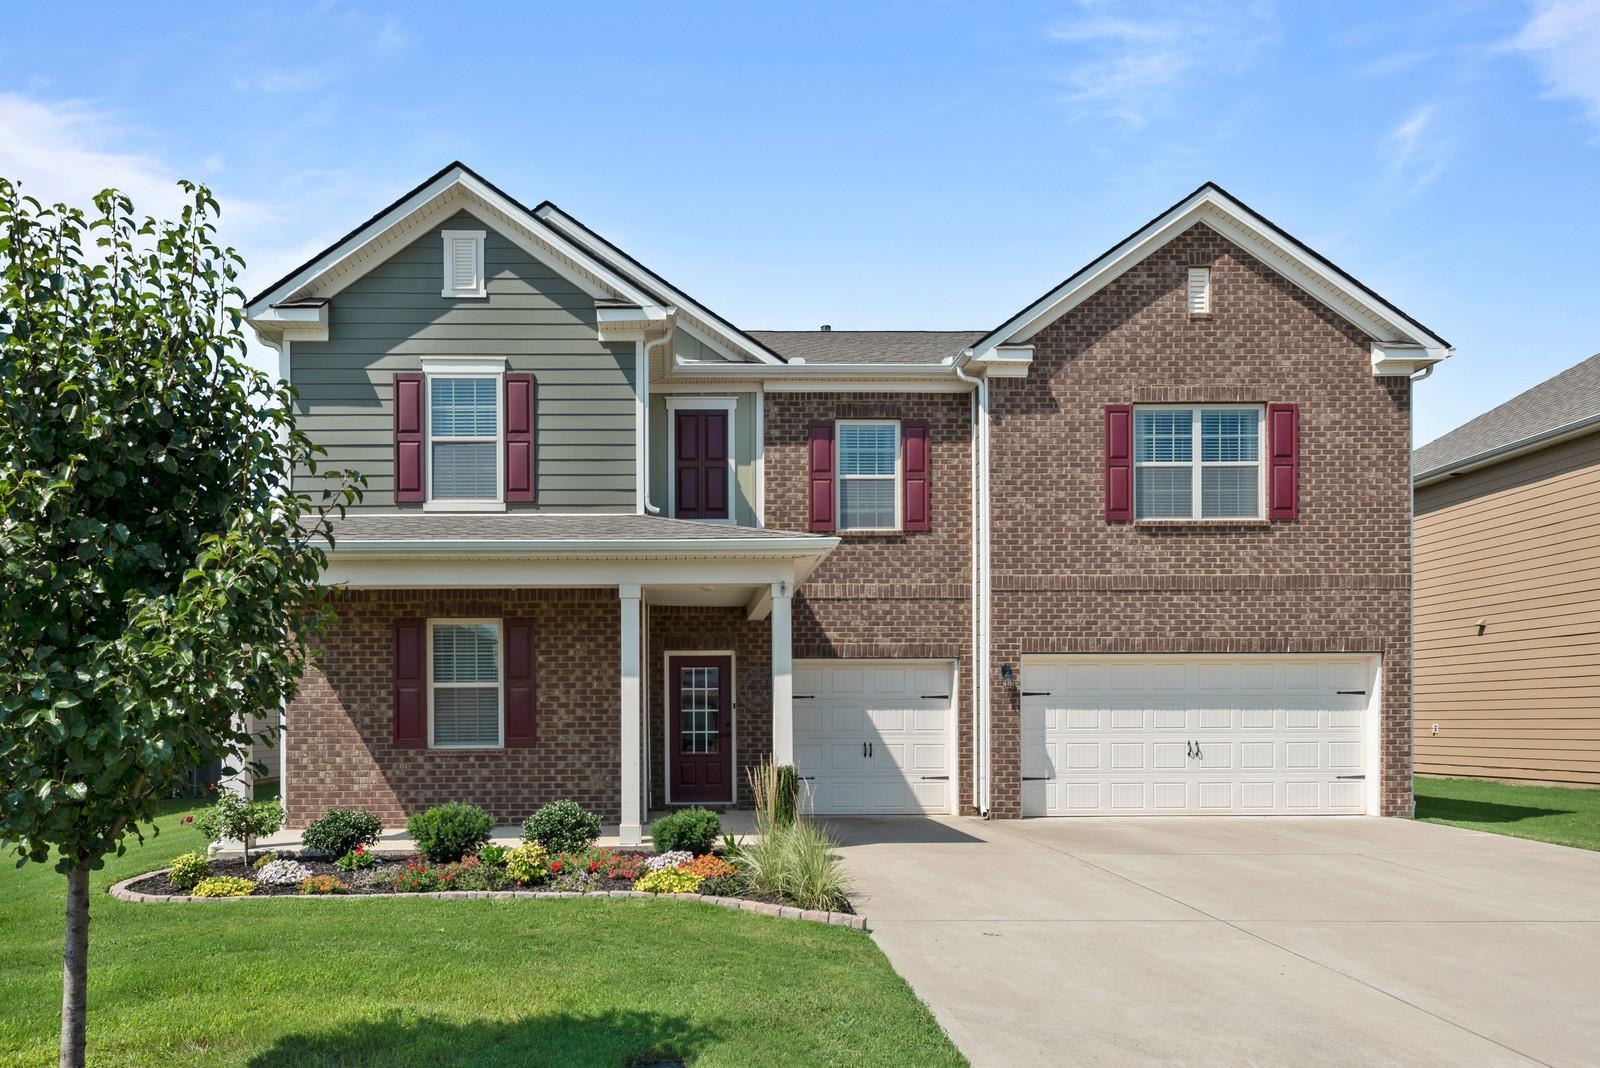 6519 Tulip Tree Dr, Murfreesboro, TN 37128 - Murfreesboro, TN real estate listing